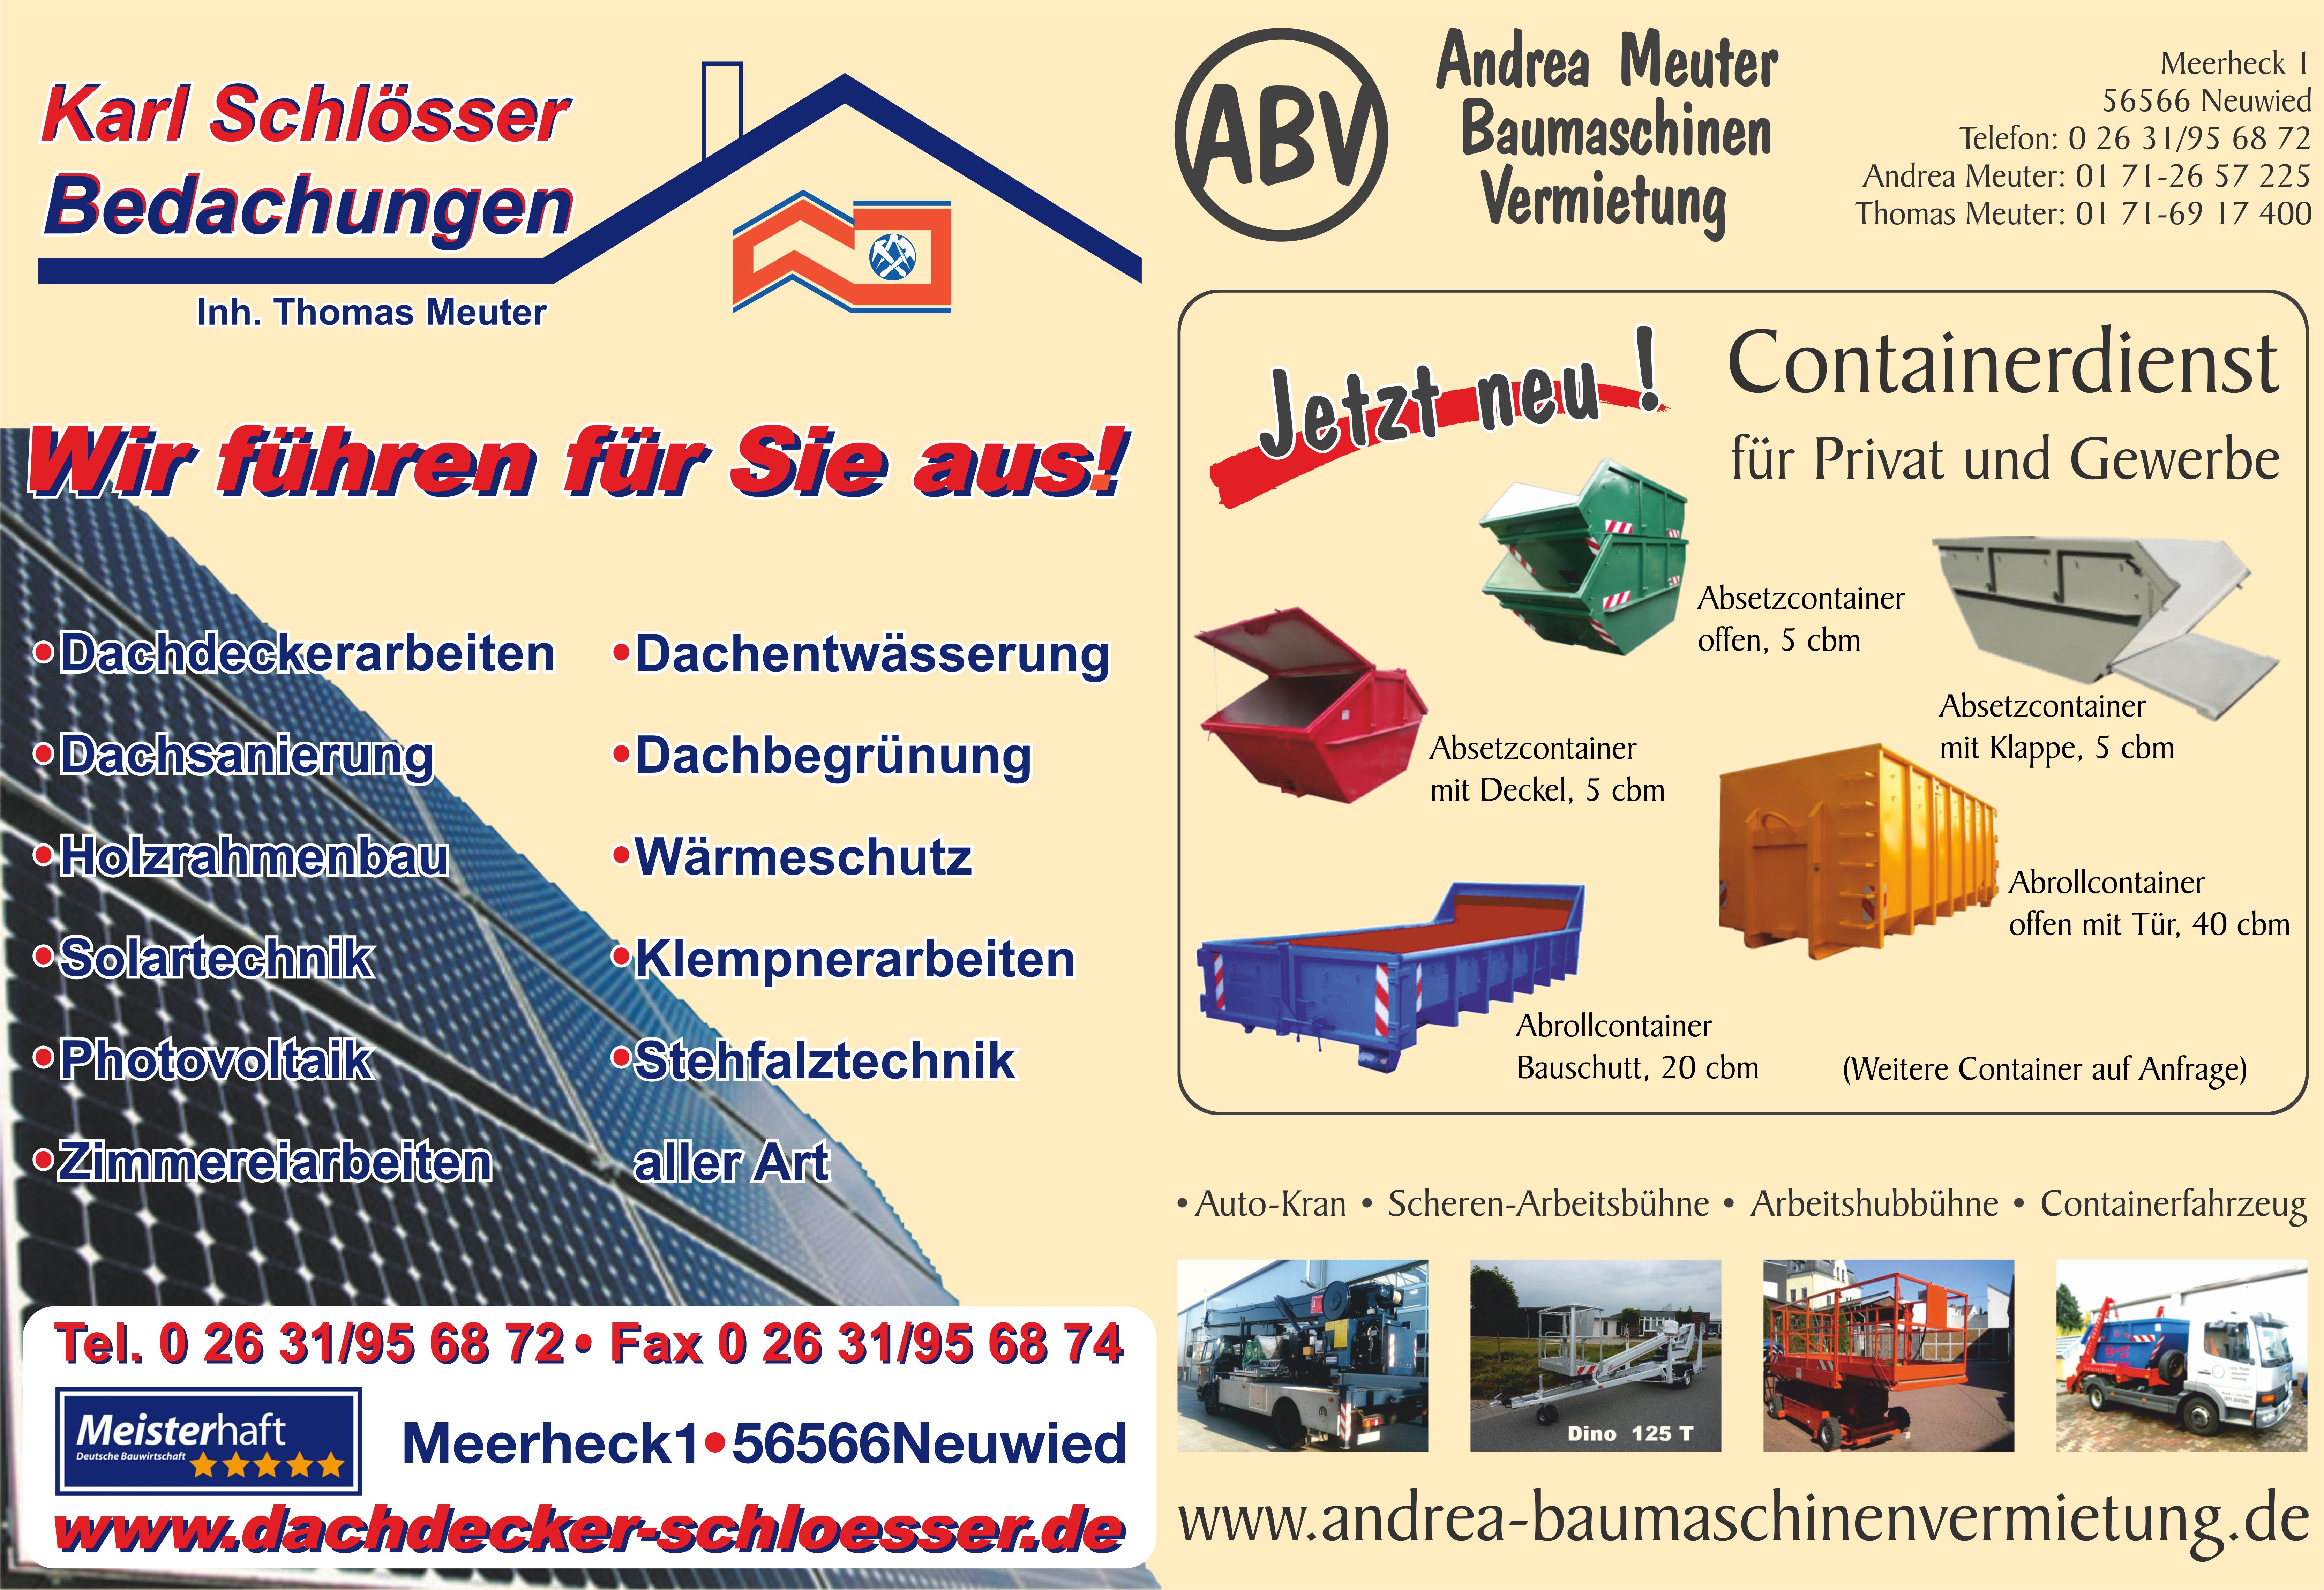 http://www.abv-containerdienst.de